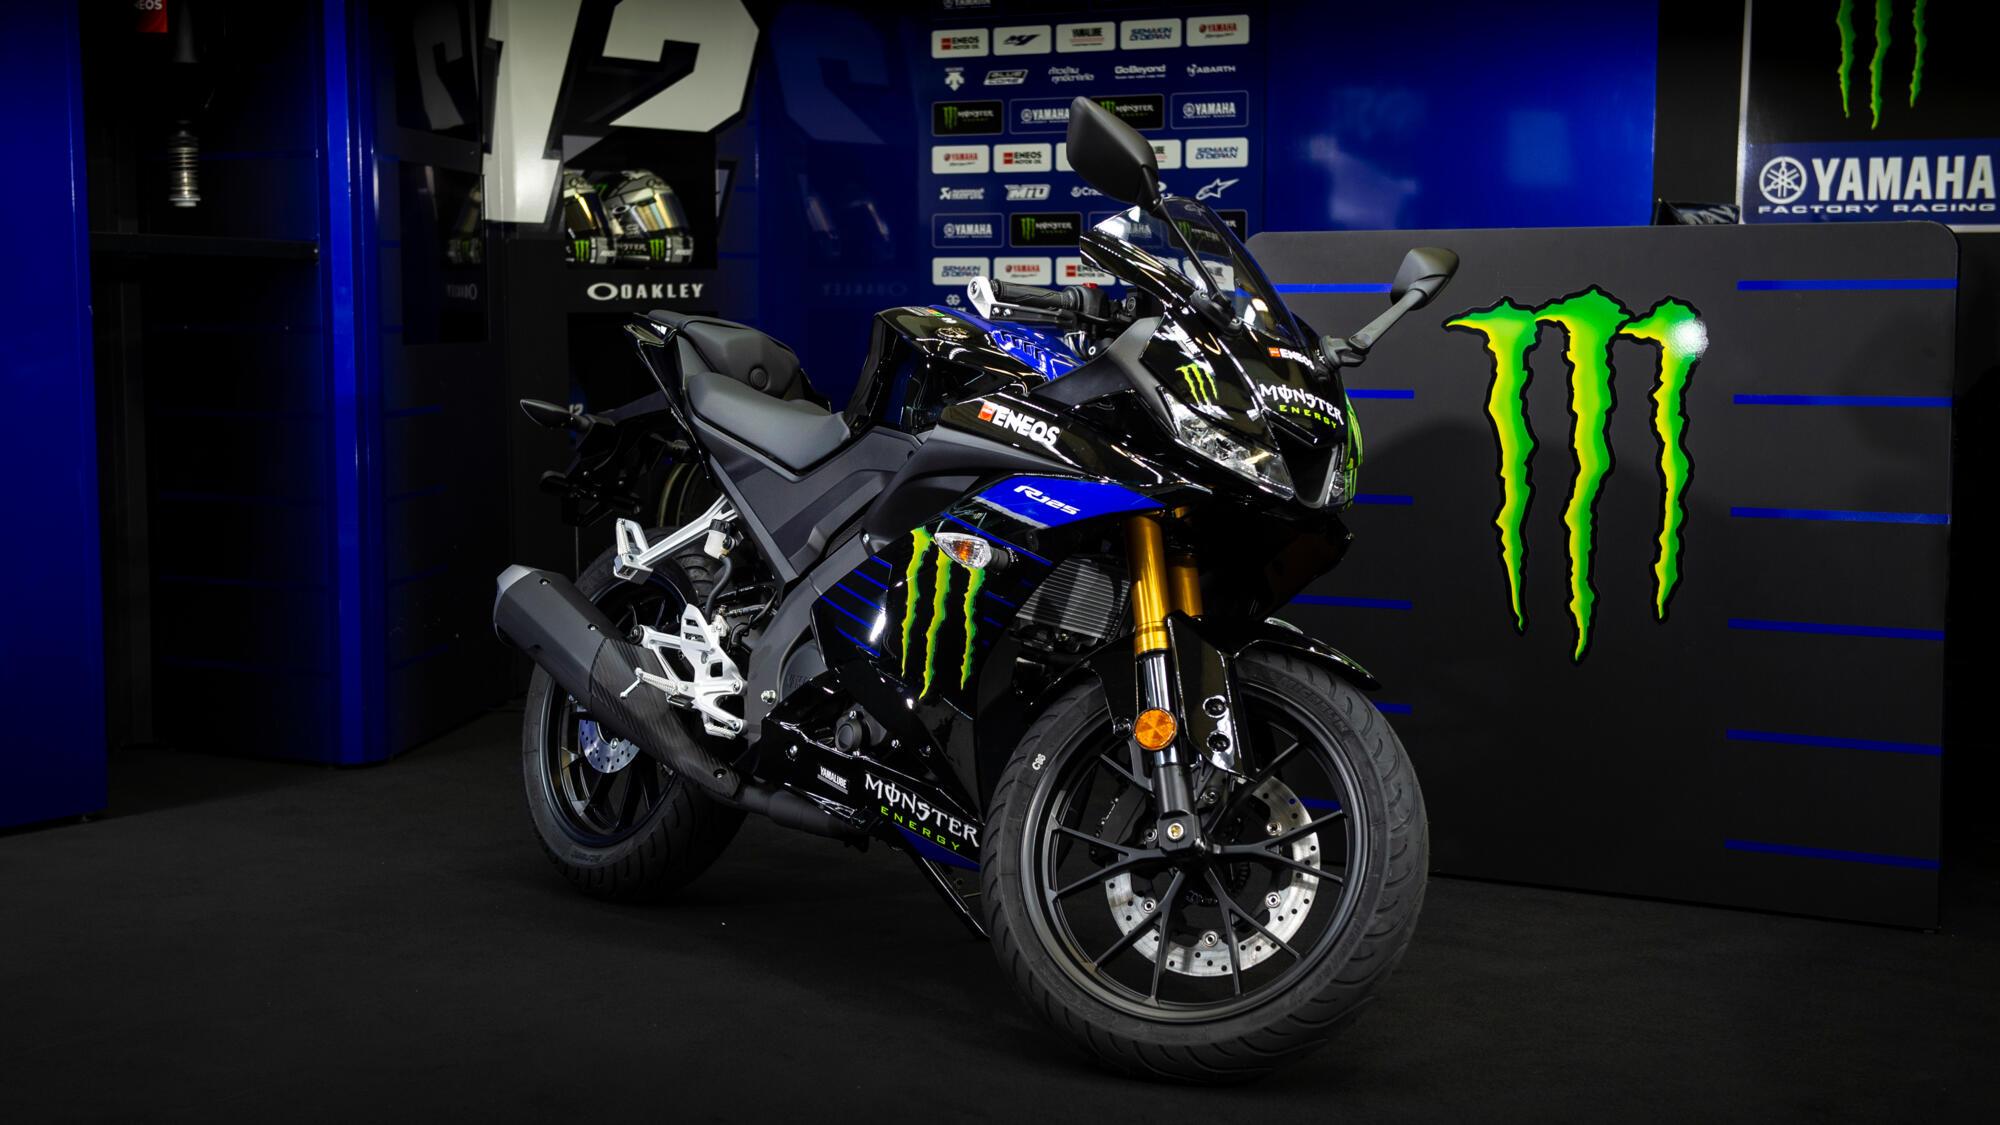 Yamaha YZF R125 Monster Energy 2019 MotoGP Edition, Midnight